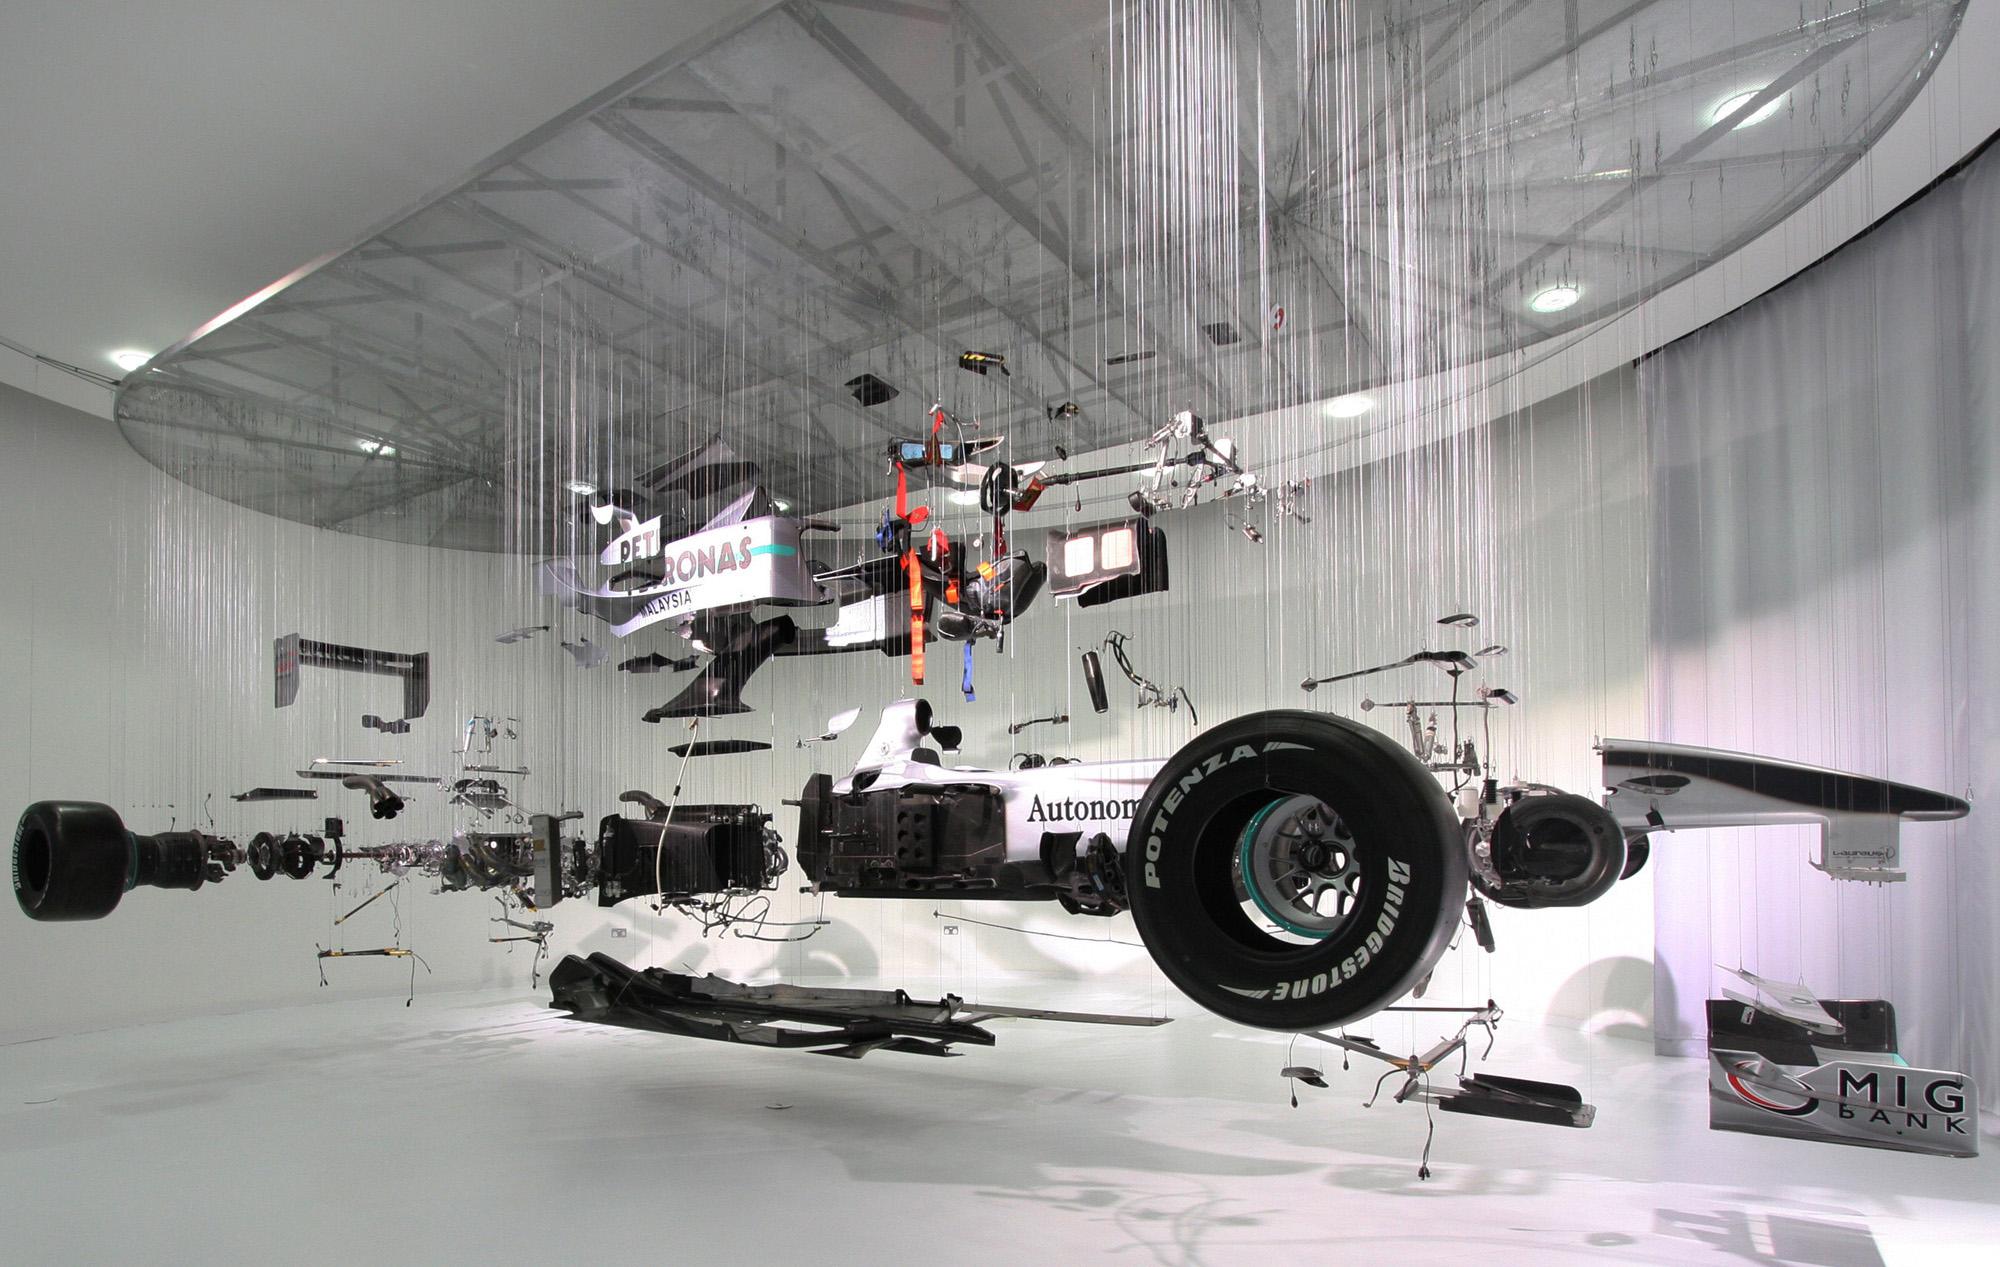 mercedes-f1-car-disassembled.jpeg